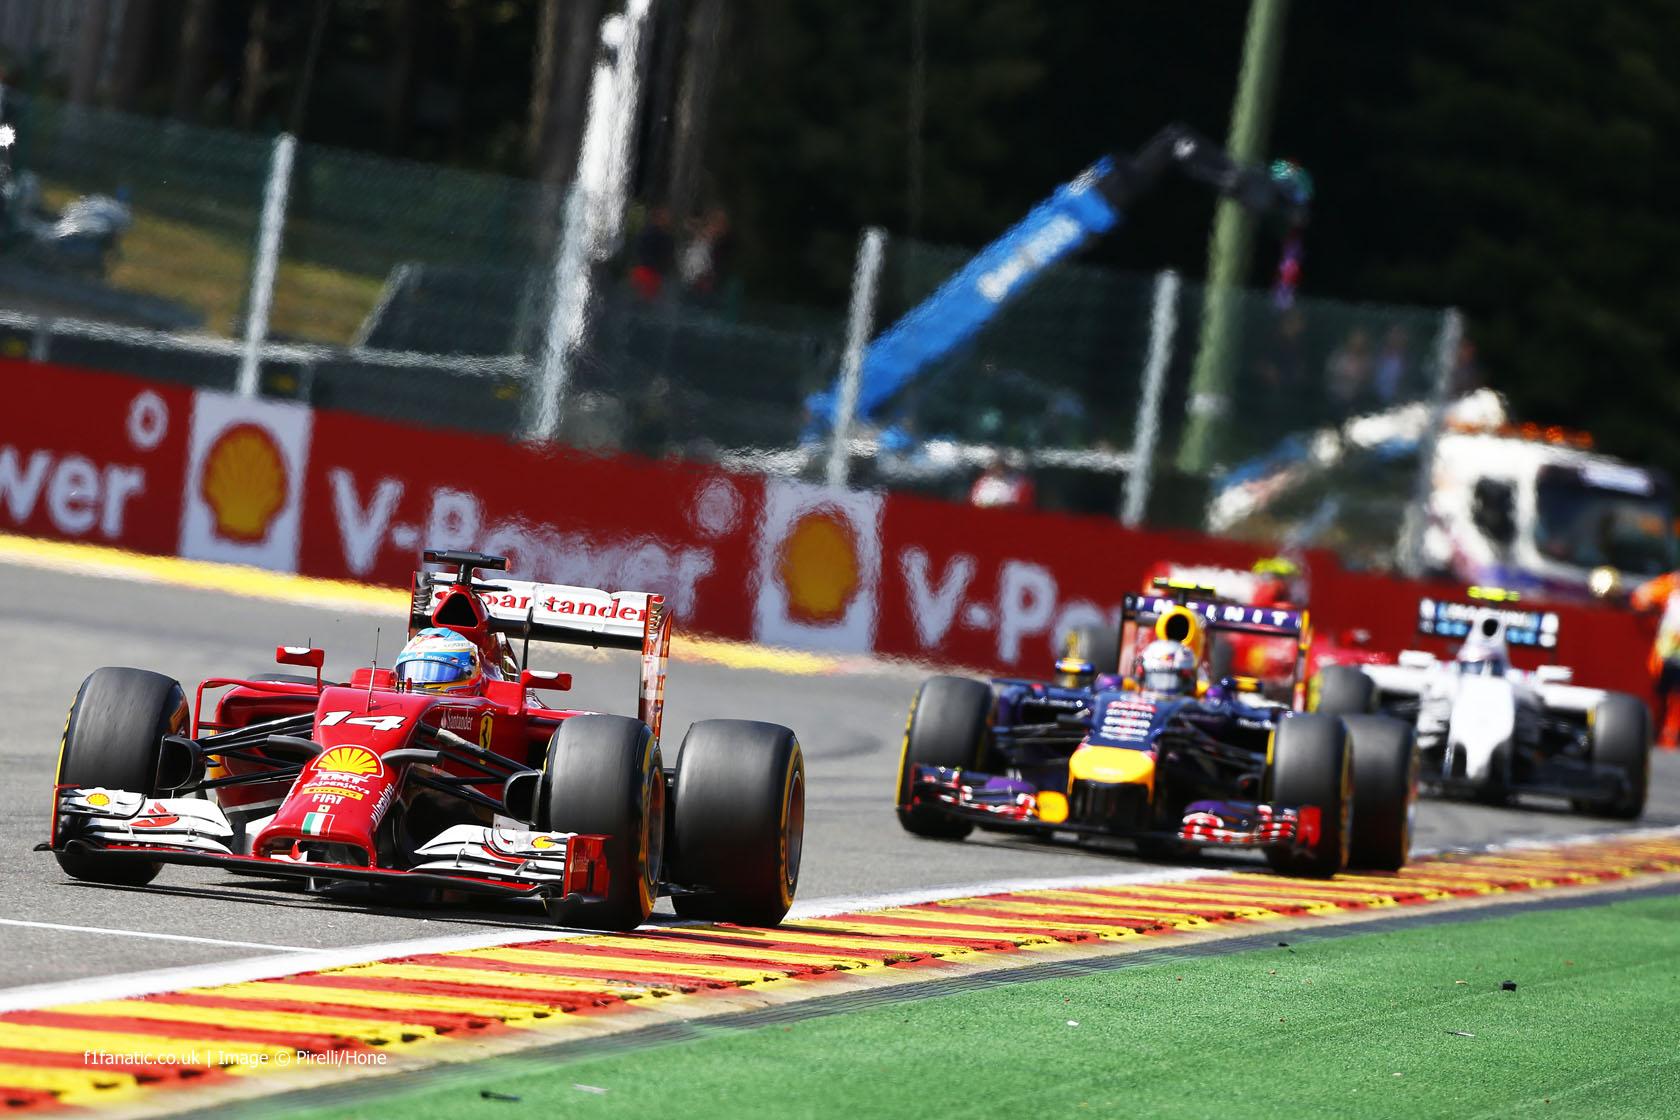 Ferrari, i piloti della Rossa vedono progressi